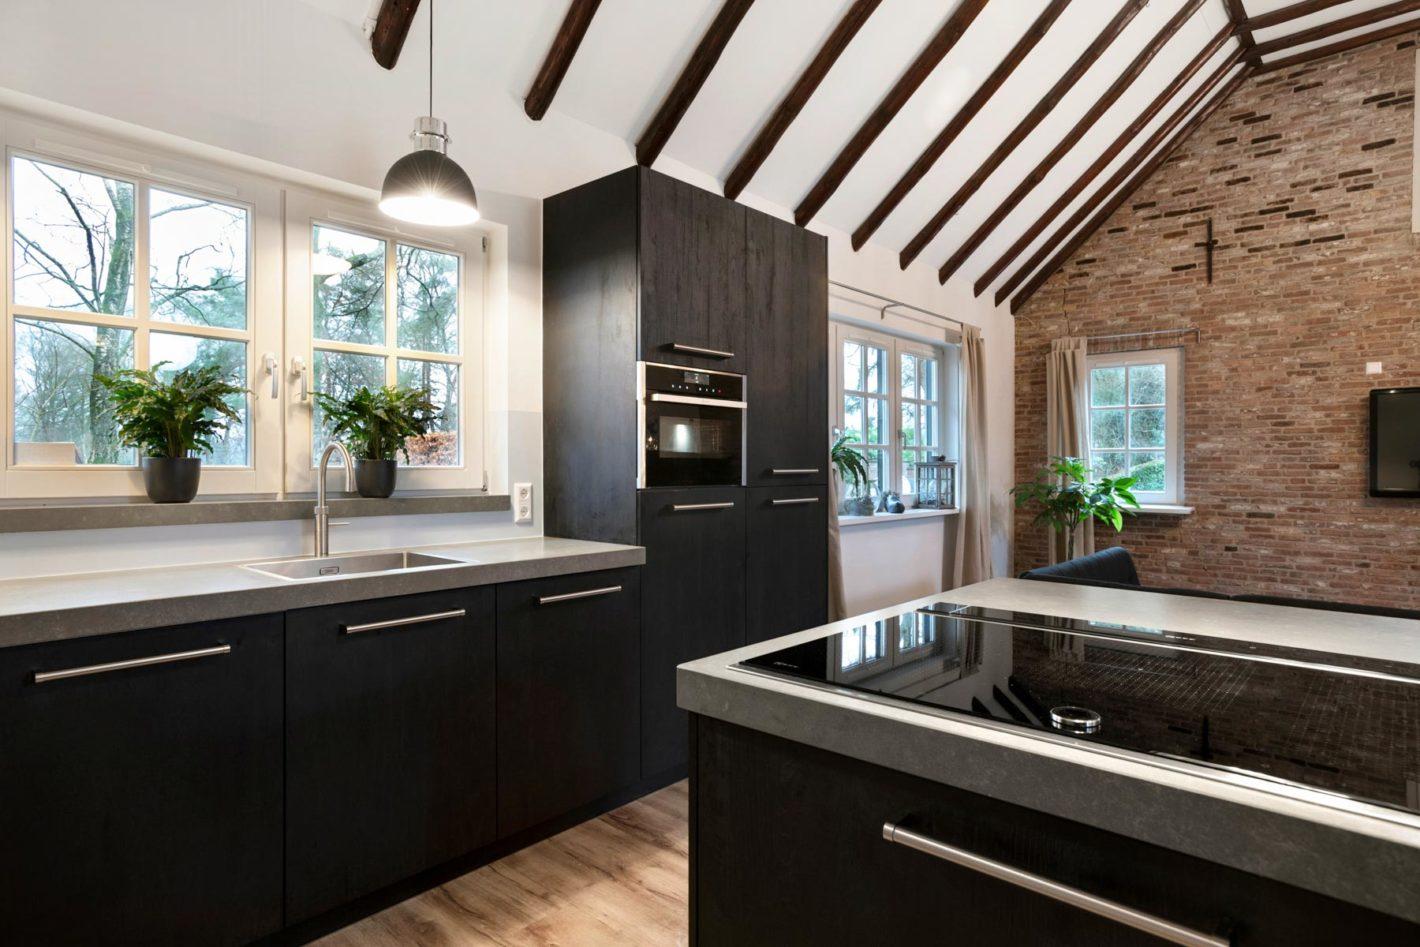 Moderne zwart-wit keuken